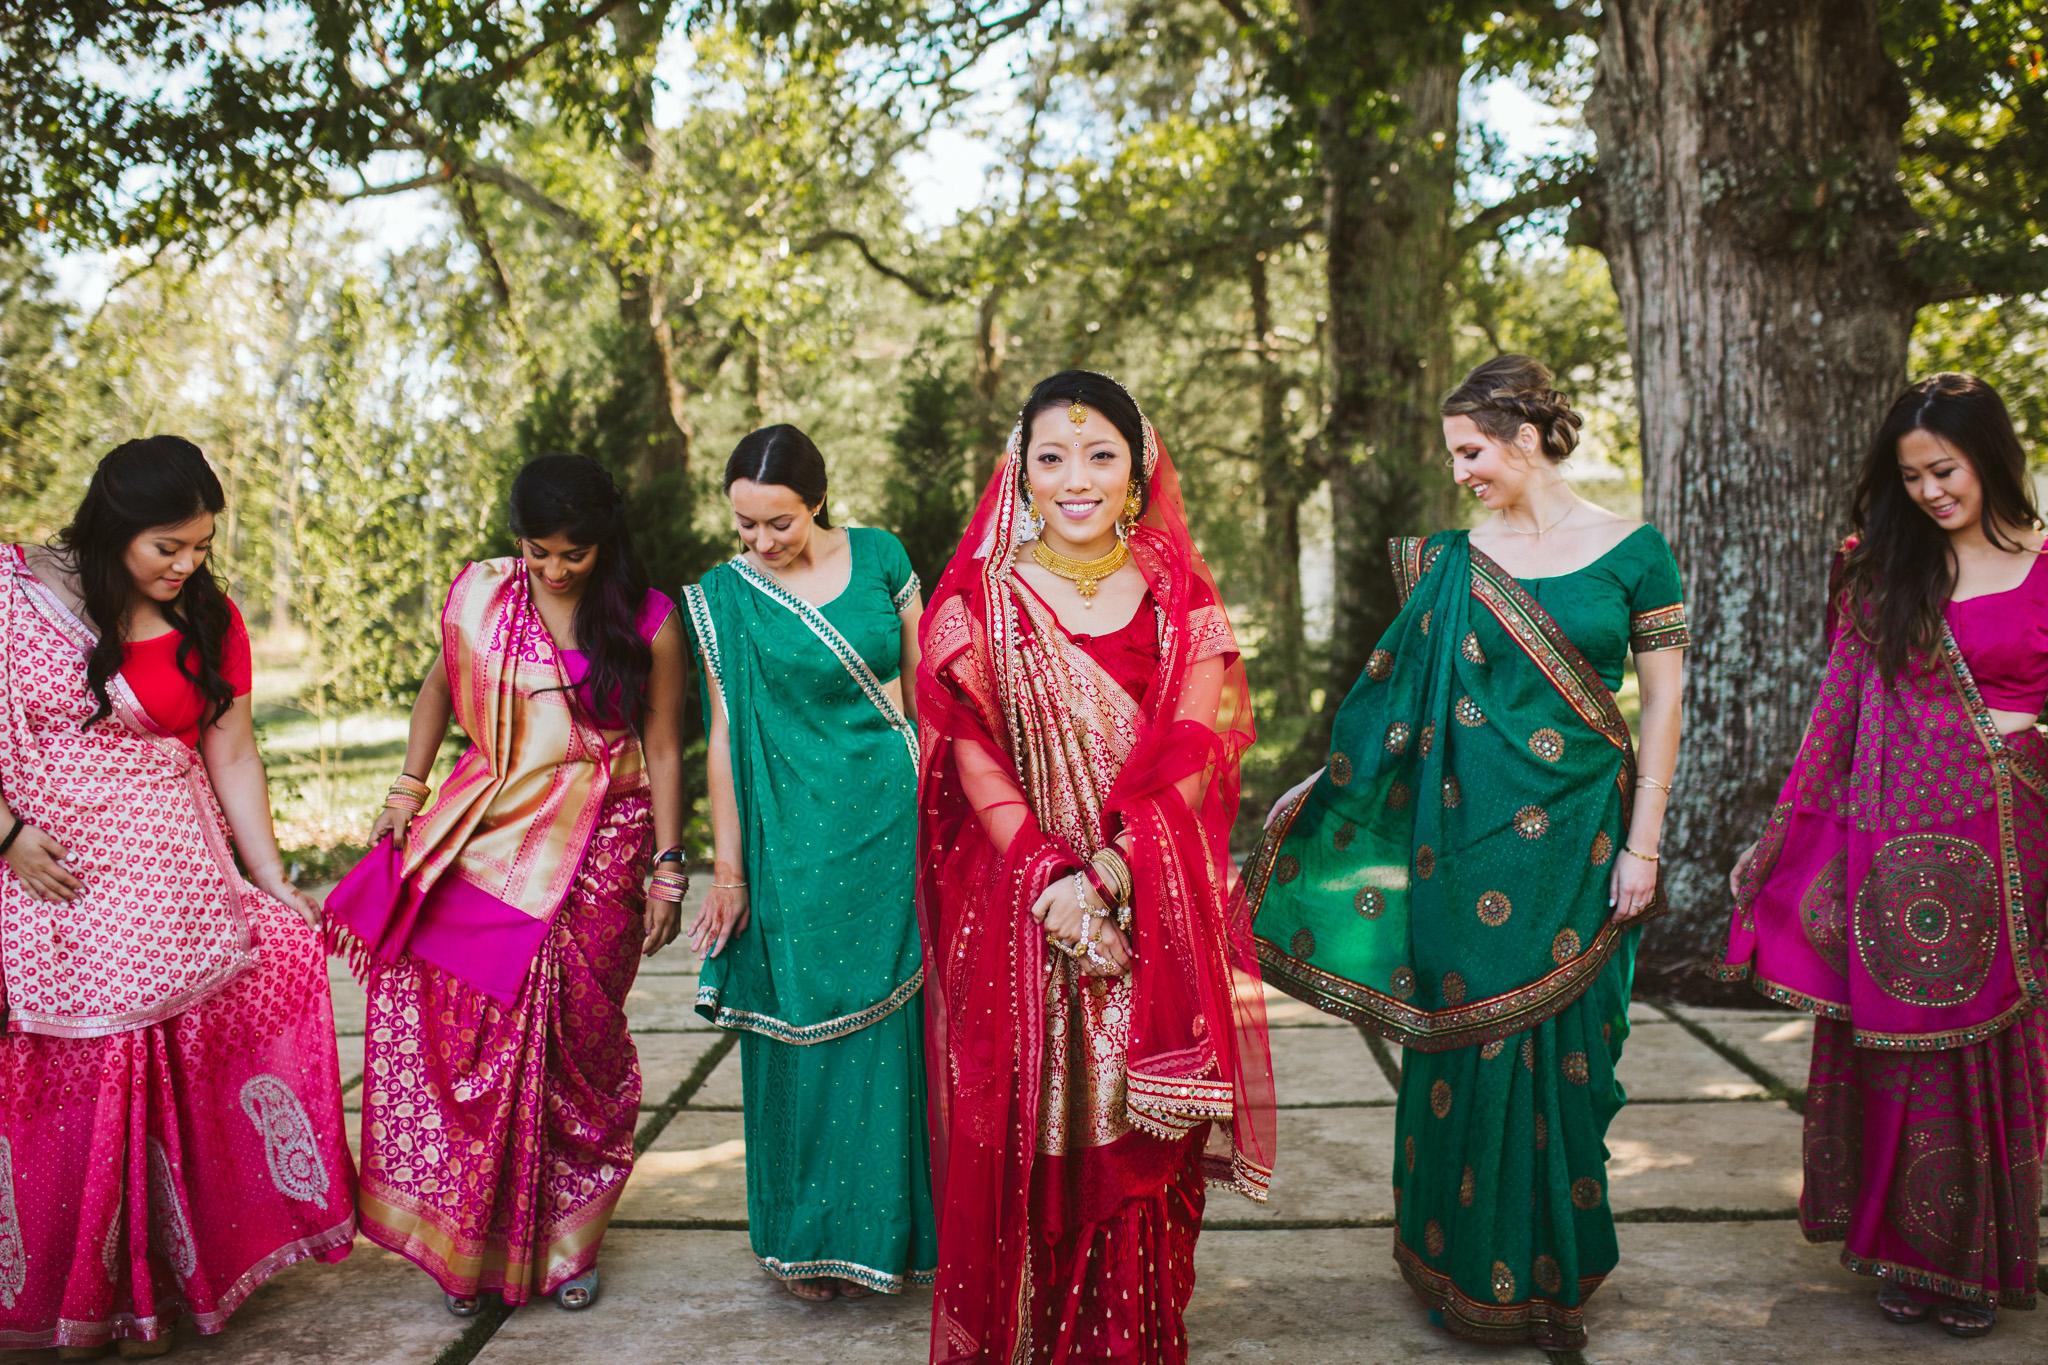 rebeccaburtphotography.hindiwedding.moraisvineyards.virginiawedding-45.JPG